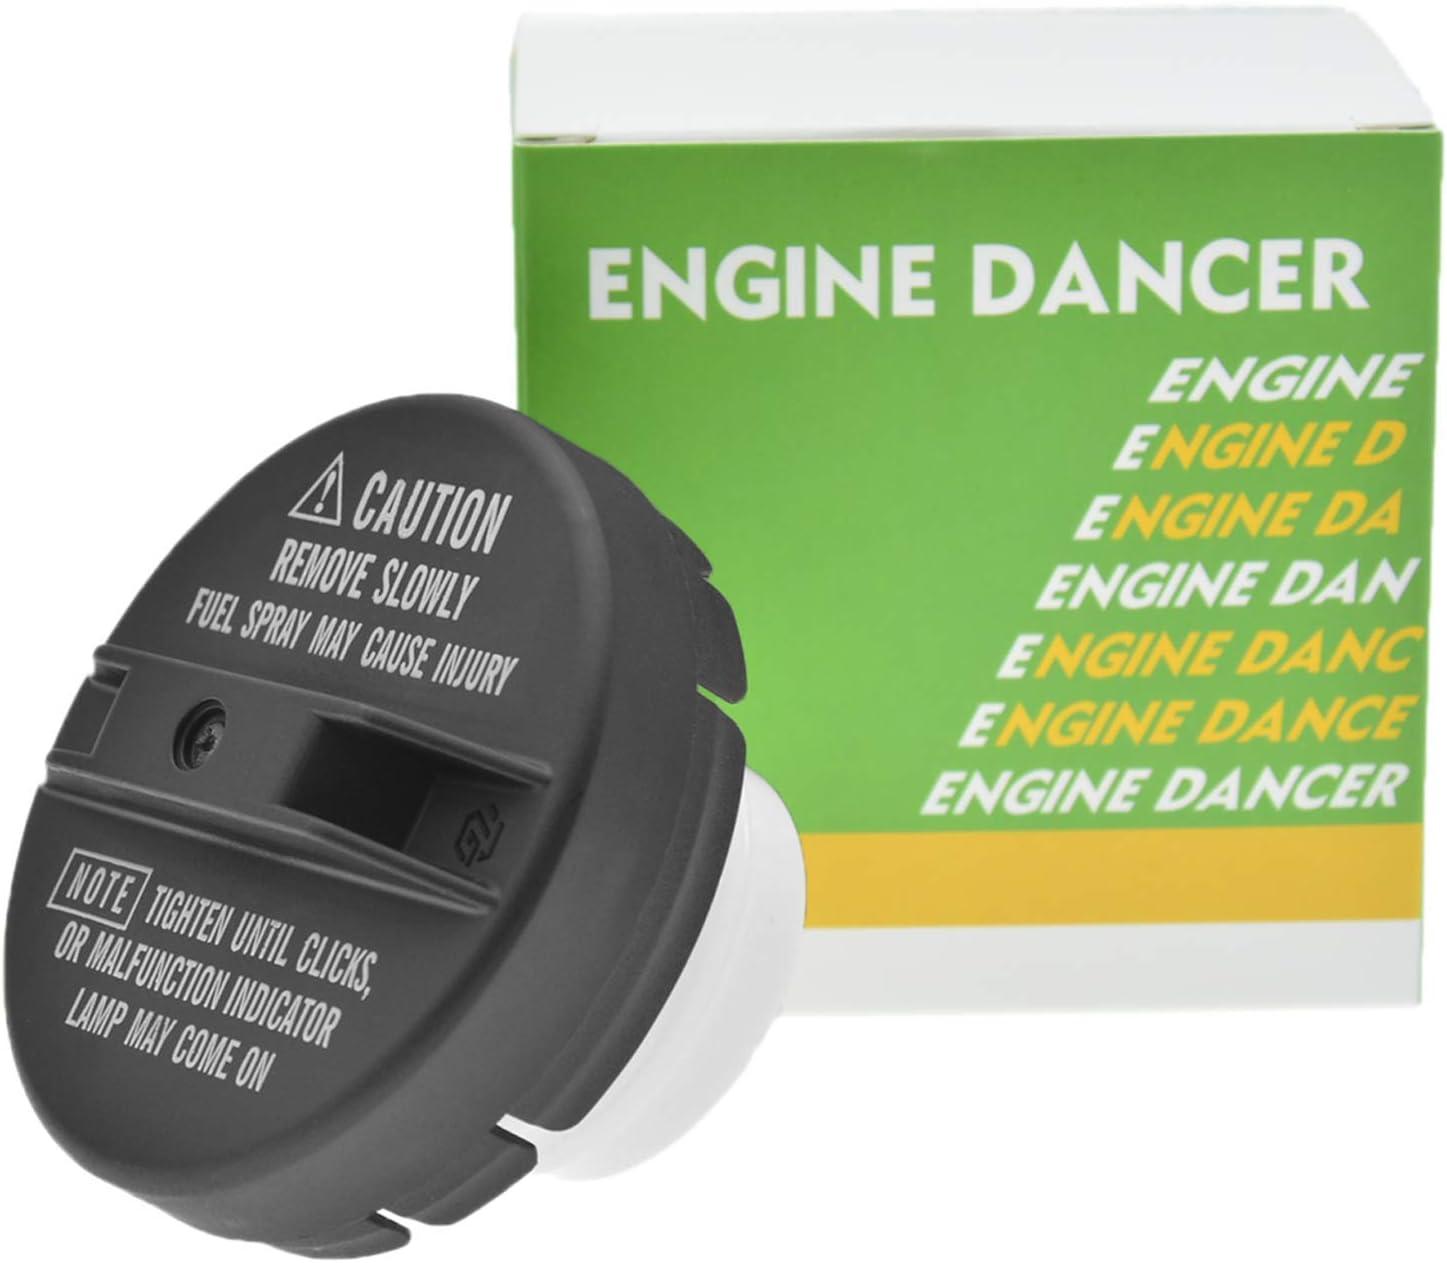 Engine Dancer Gas Cap Fuel Tank Cap Fuel Filler Cap Assembly 77310-48020 Compatible with 1989-2001 Toyota and Lexus Camry Corolla Avalon Land Cruiser RAV4 ES300 GS300 GS400 GS430 LX470 RX300 SC400